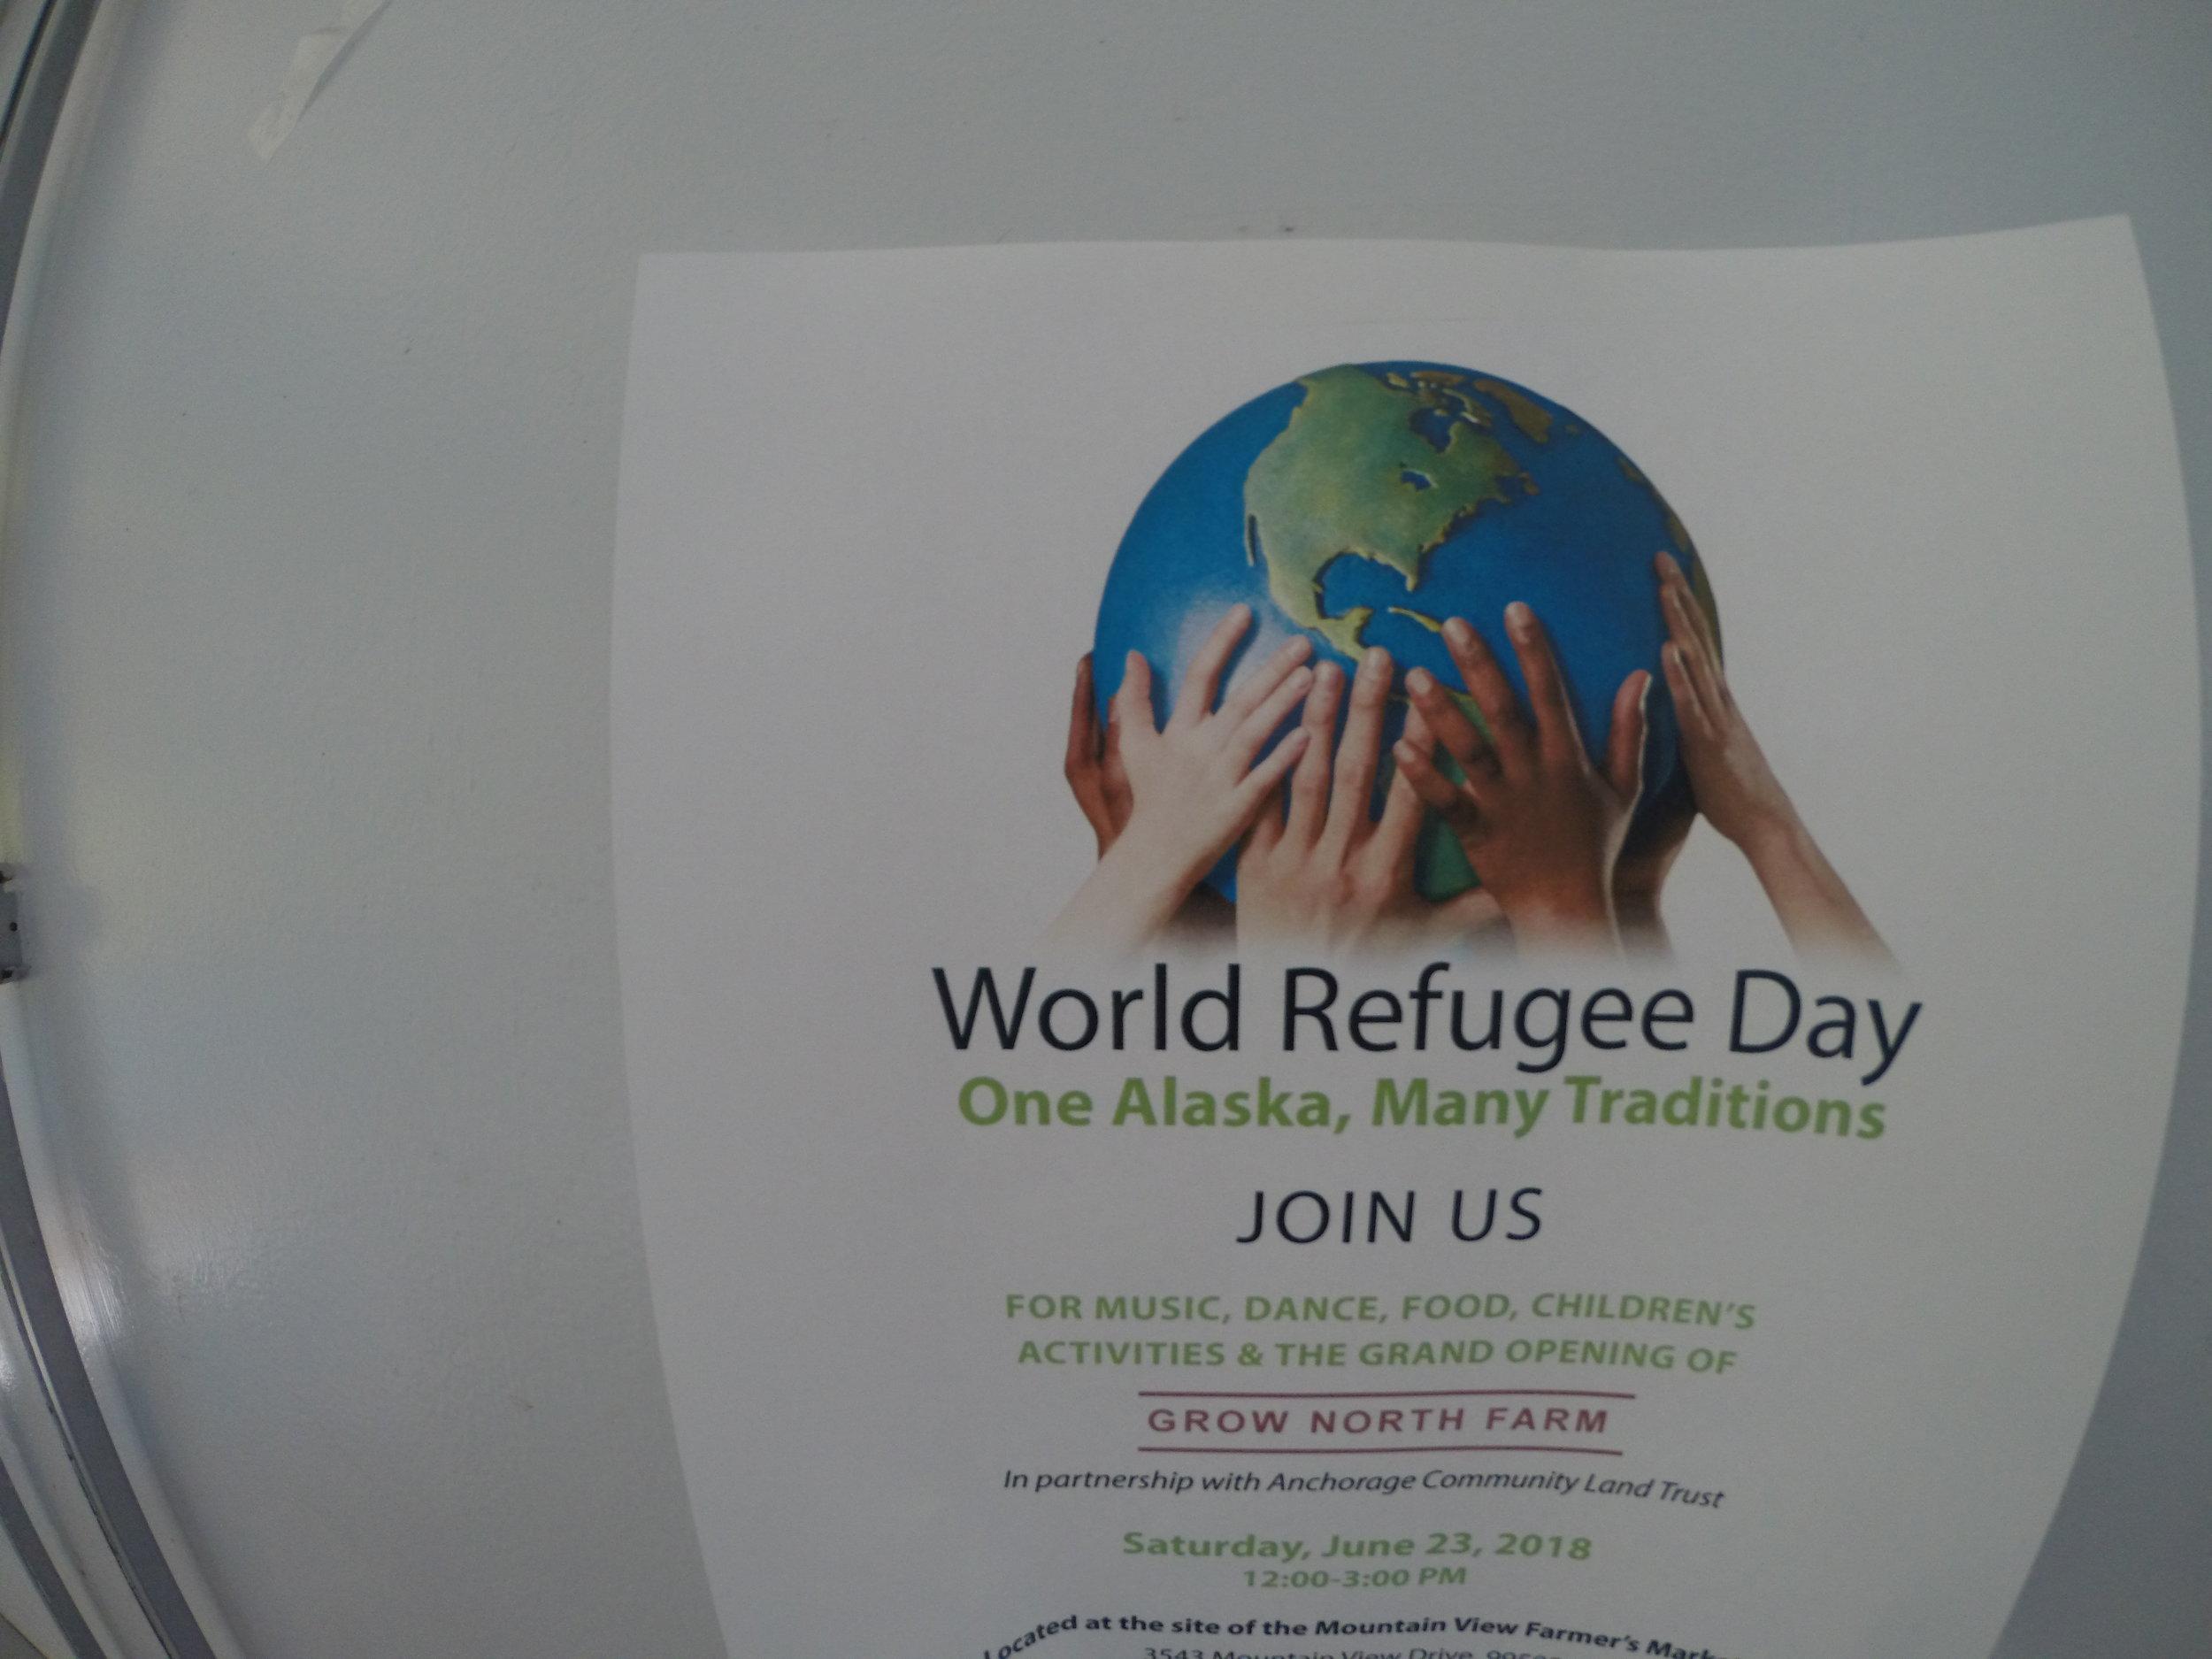 World Refugee Day event